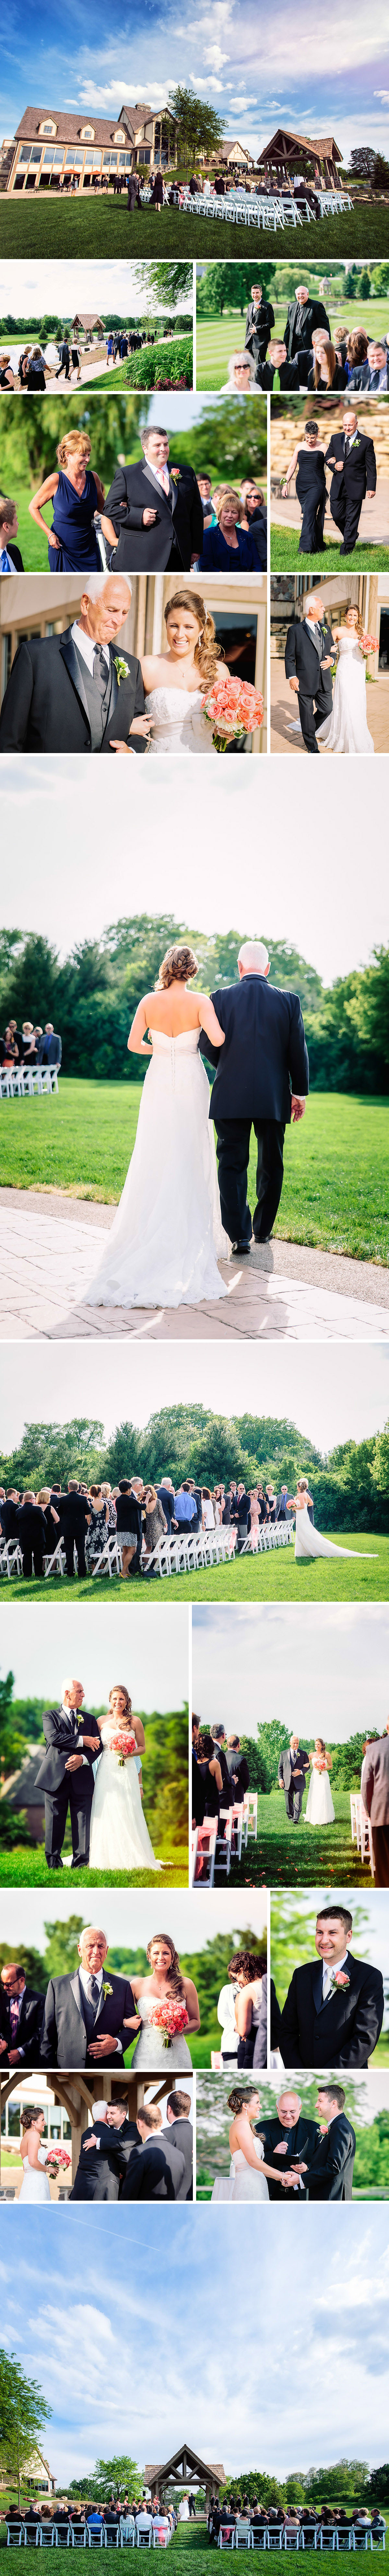 Chicago_Fine_Art_Wedding_Photography_olson3